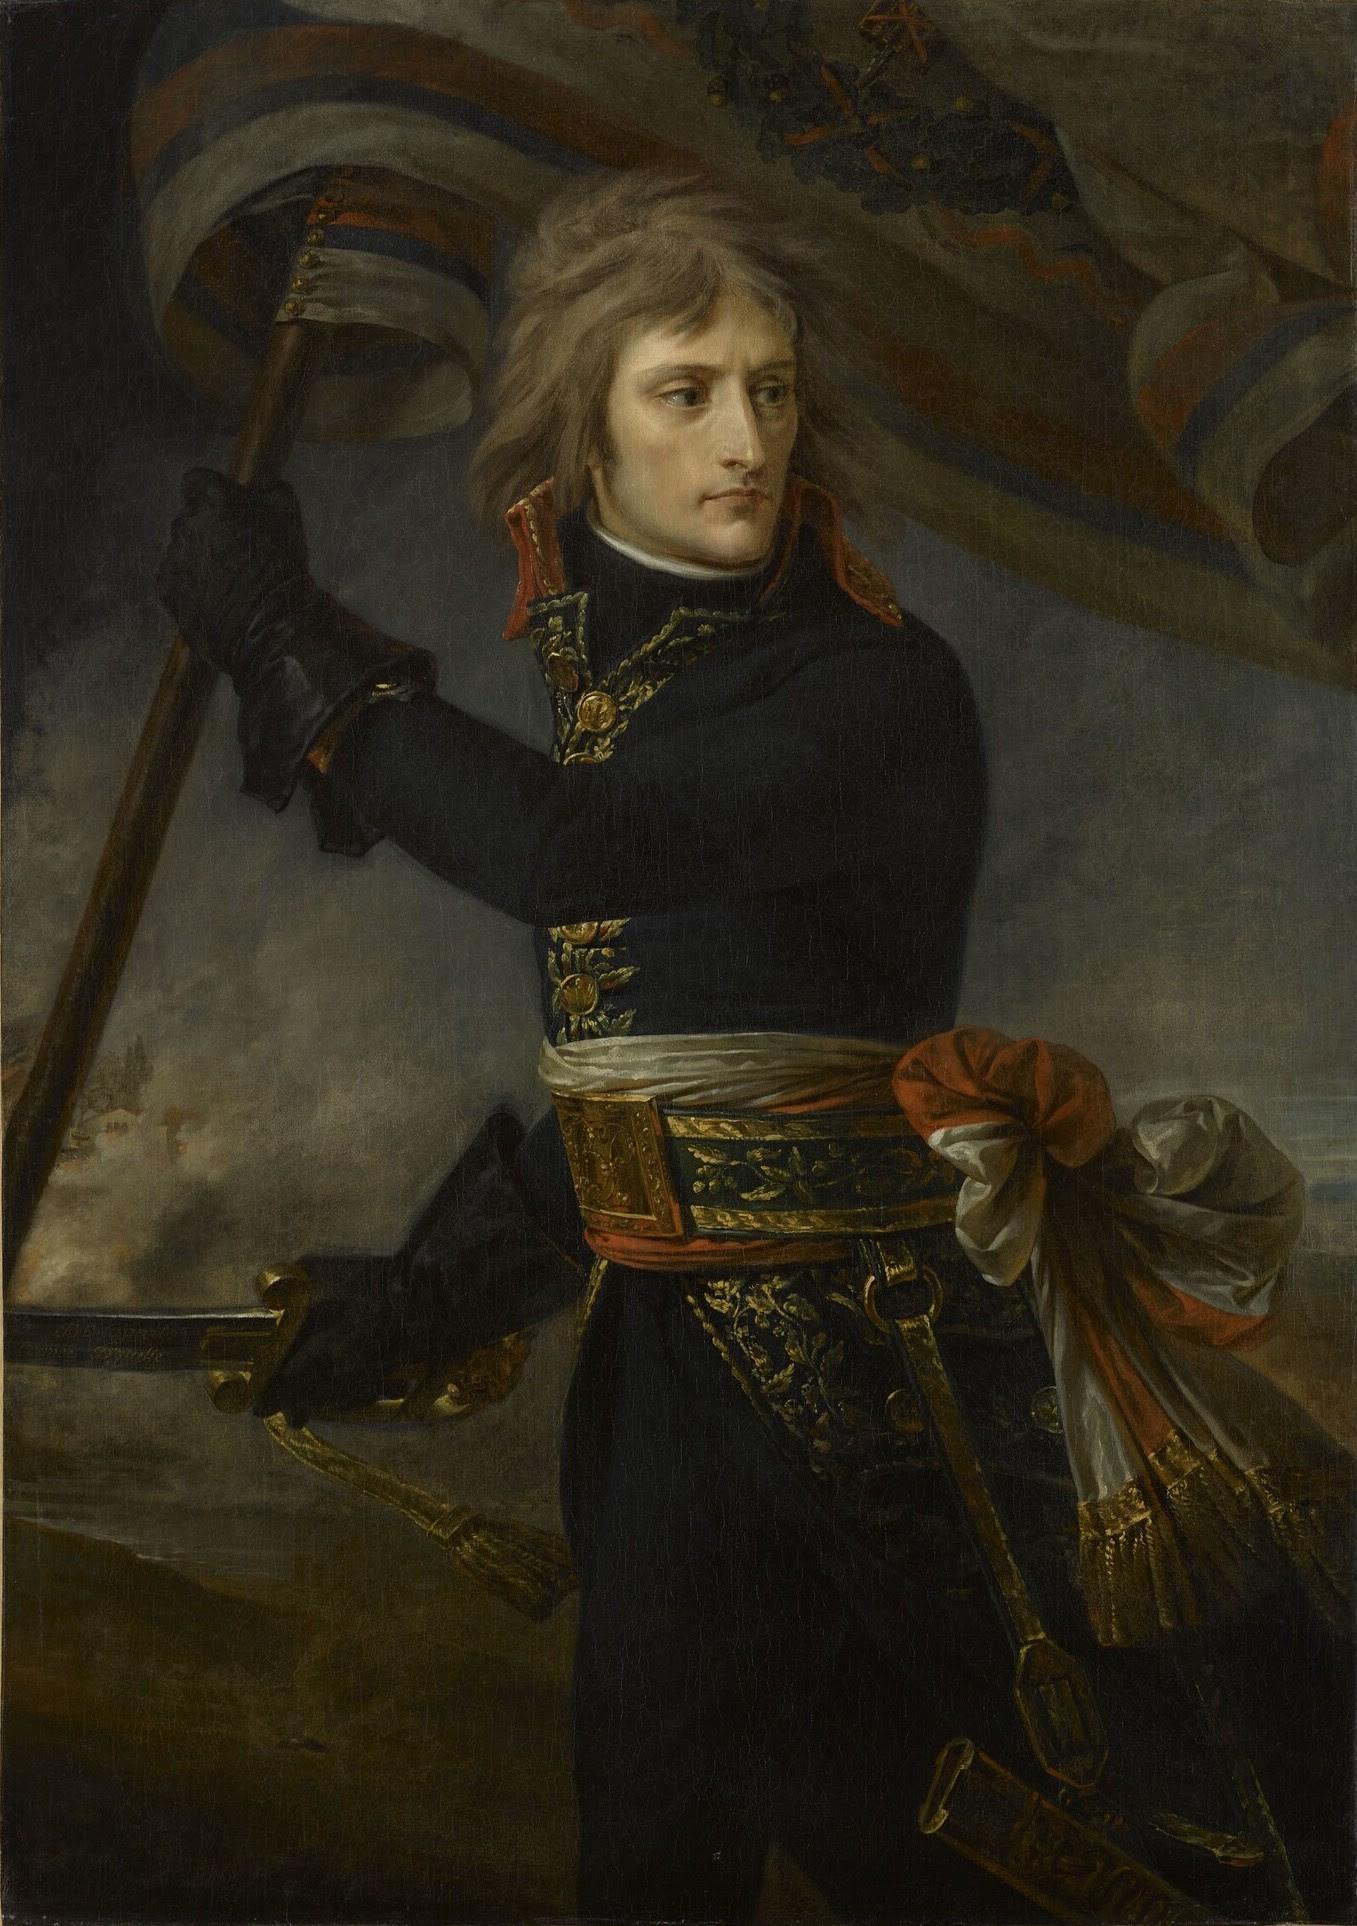 1801 Antoine-Jean Gros - Bonaparte on the Bridge at Arcole.jpg